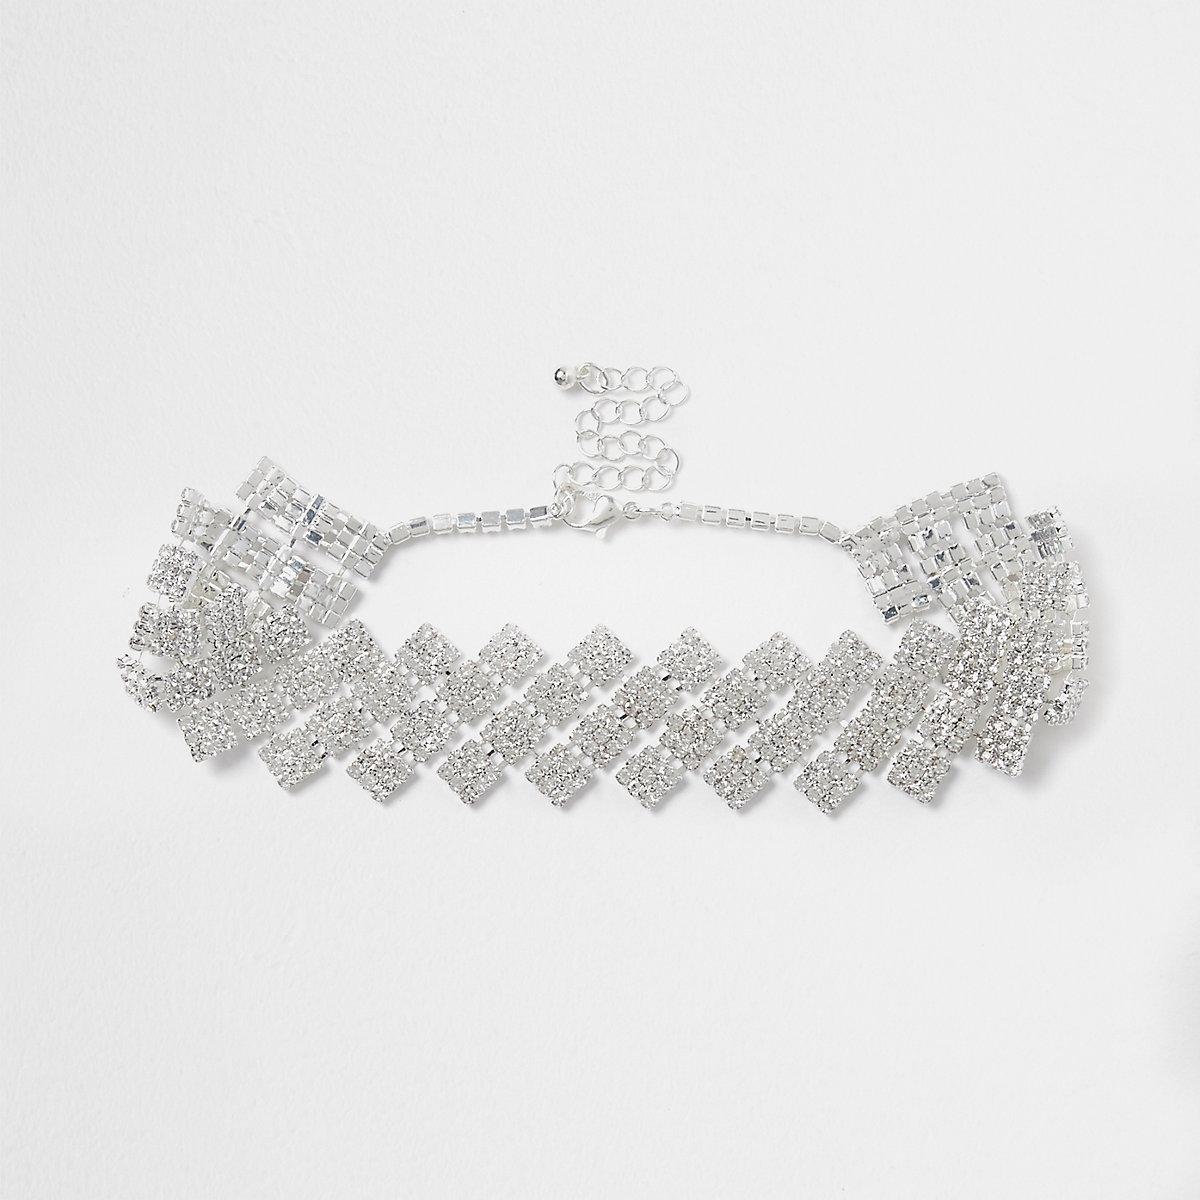 Silver tone diamond rhinestone choker